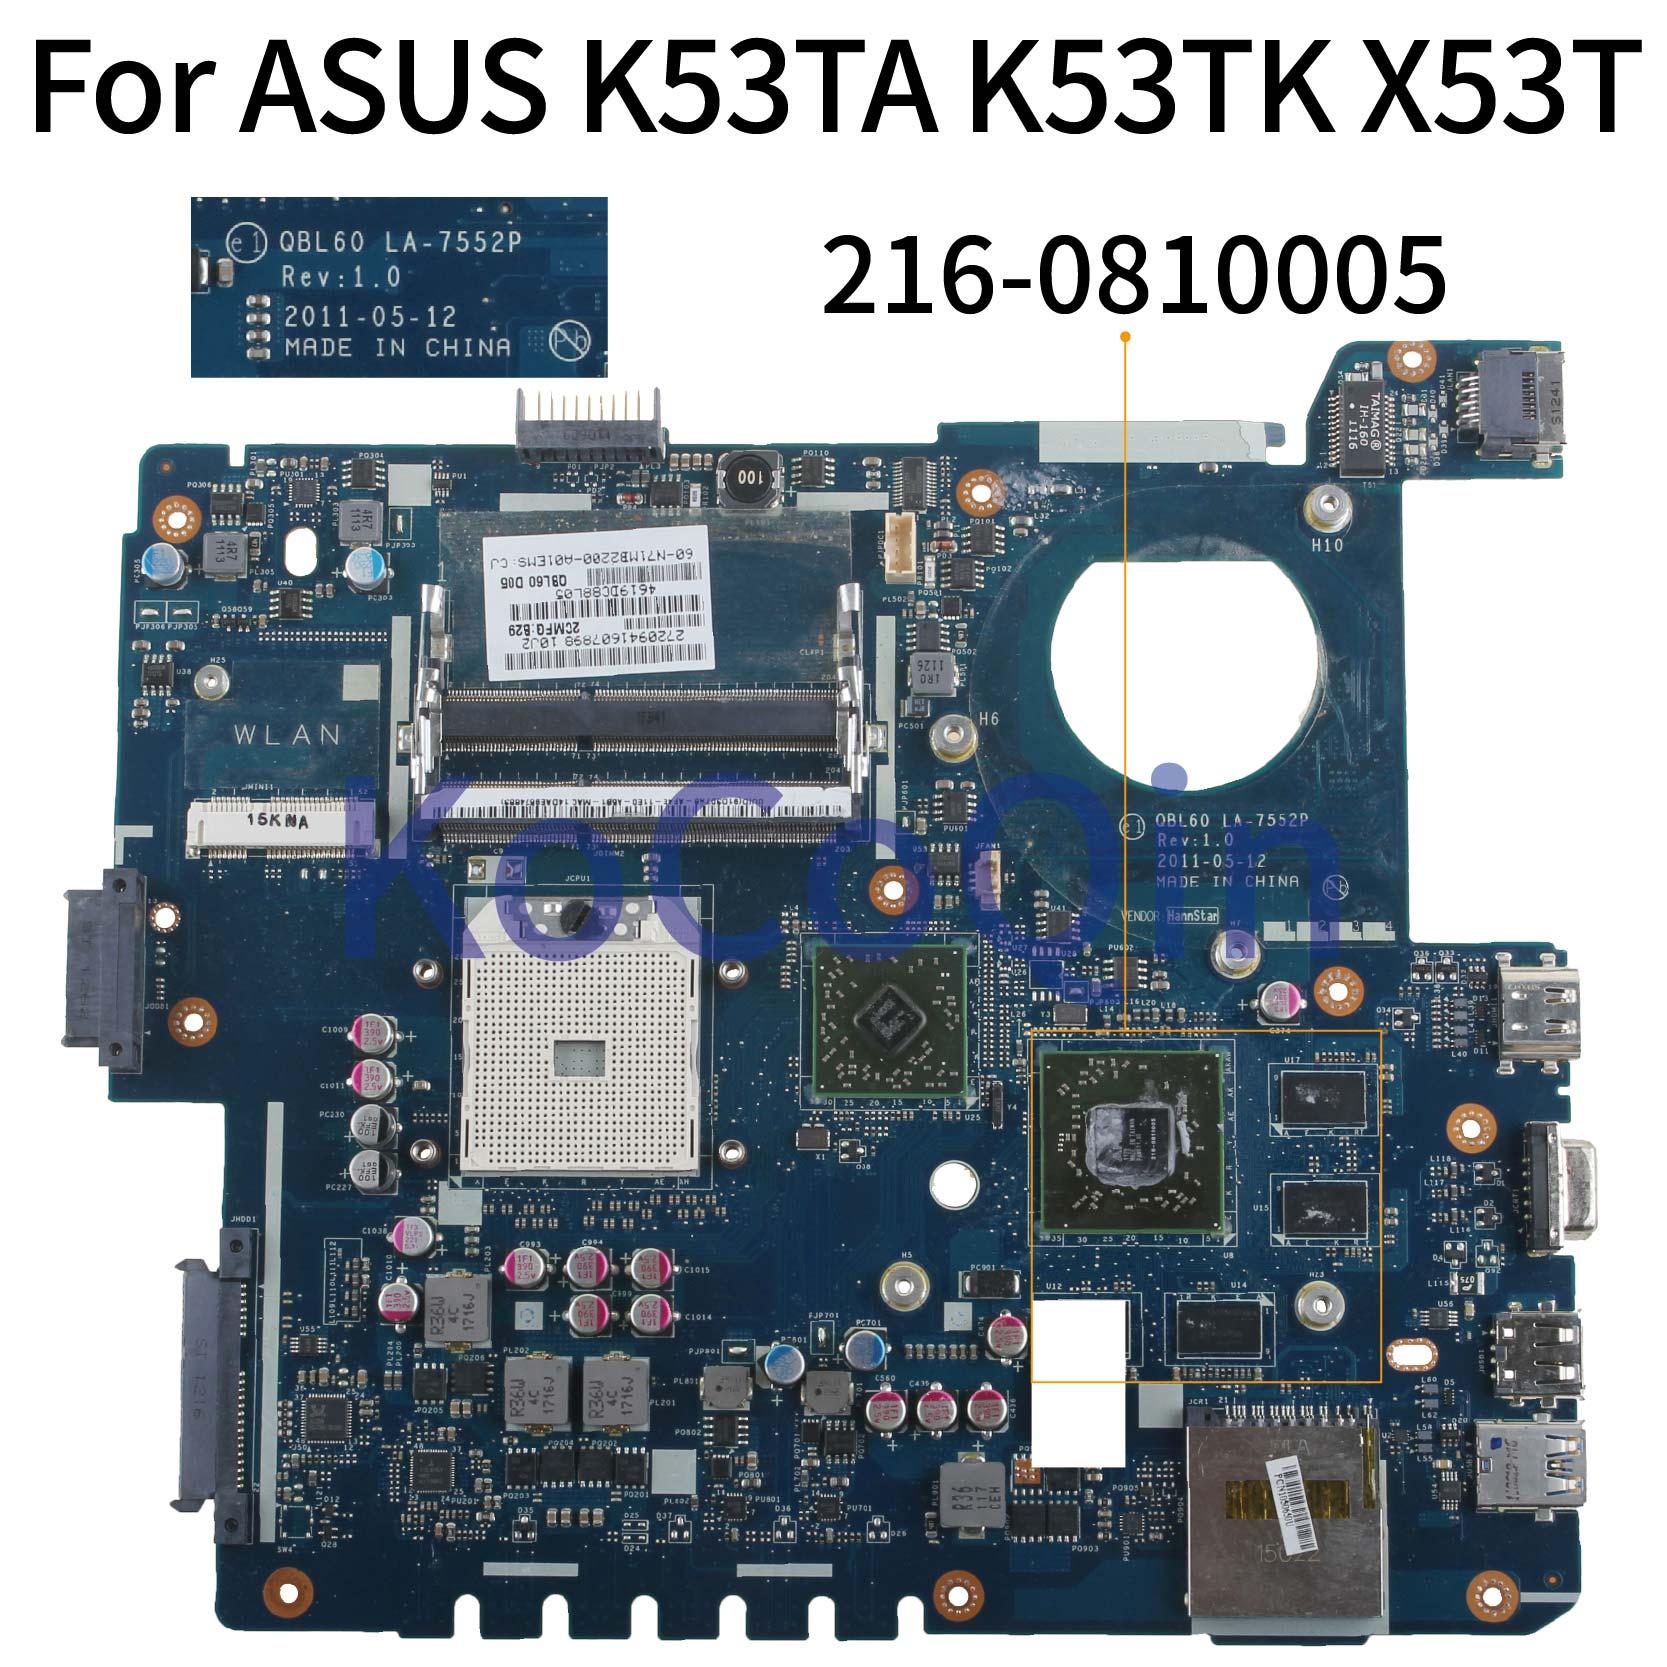 KoCoQin اللوحة لابتوب ASUS K53TA K53TK X53T اللوحة QBL60 LA-7552P 216-0810005